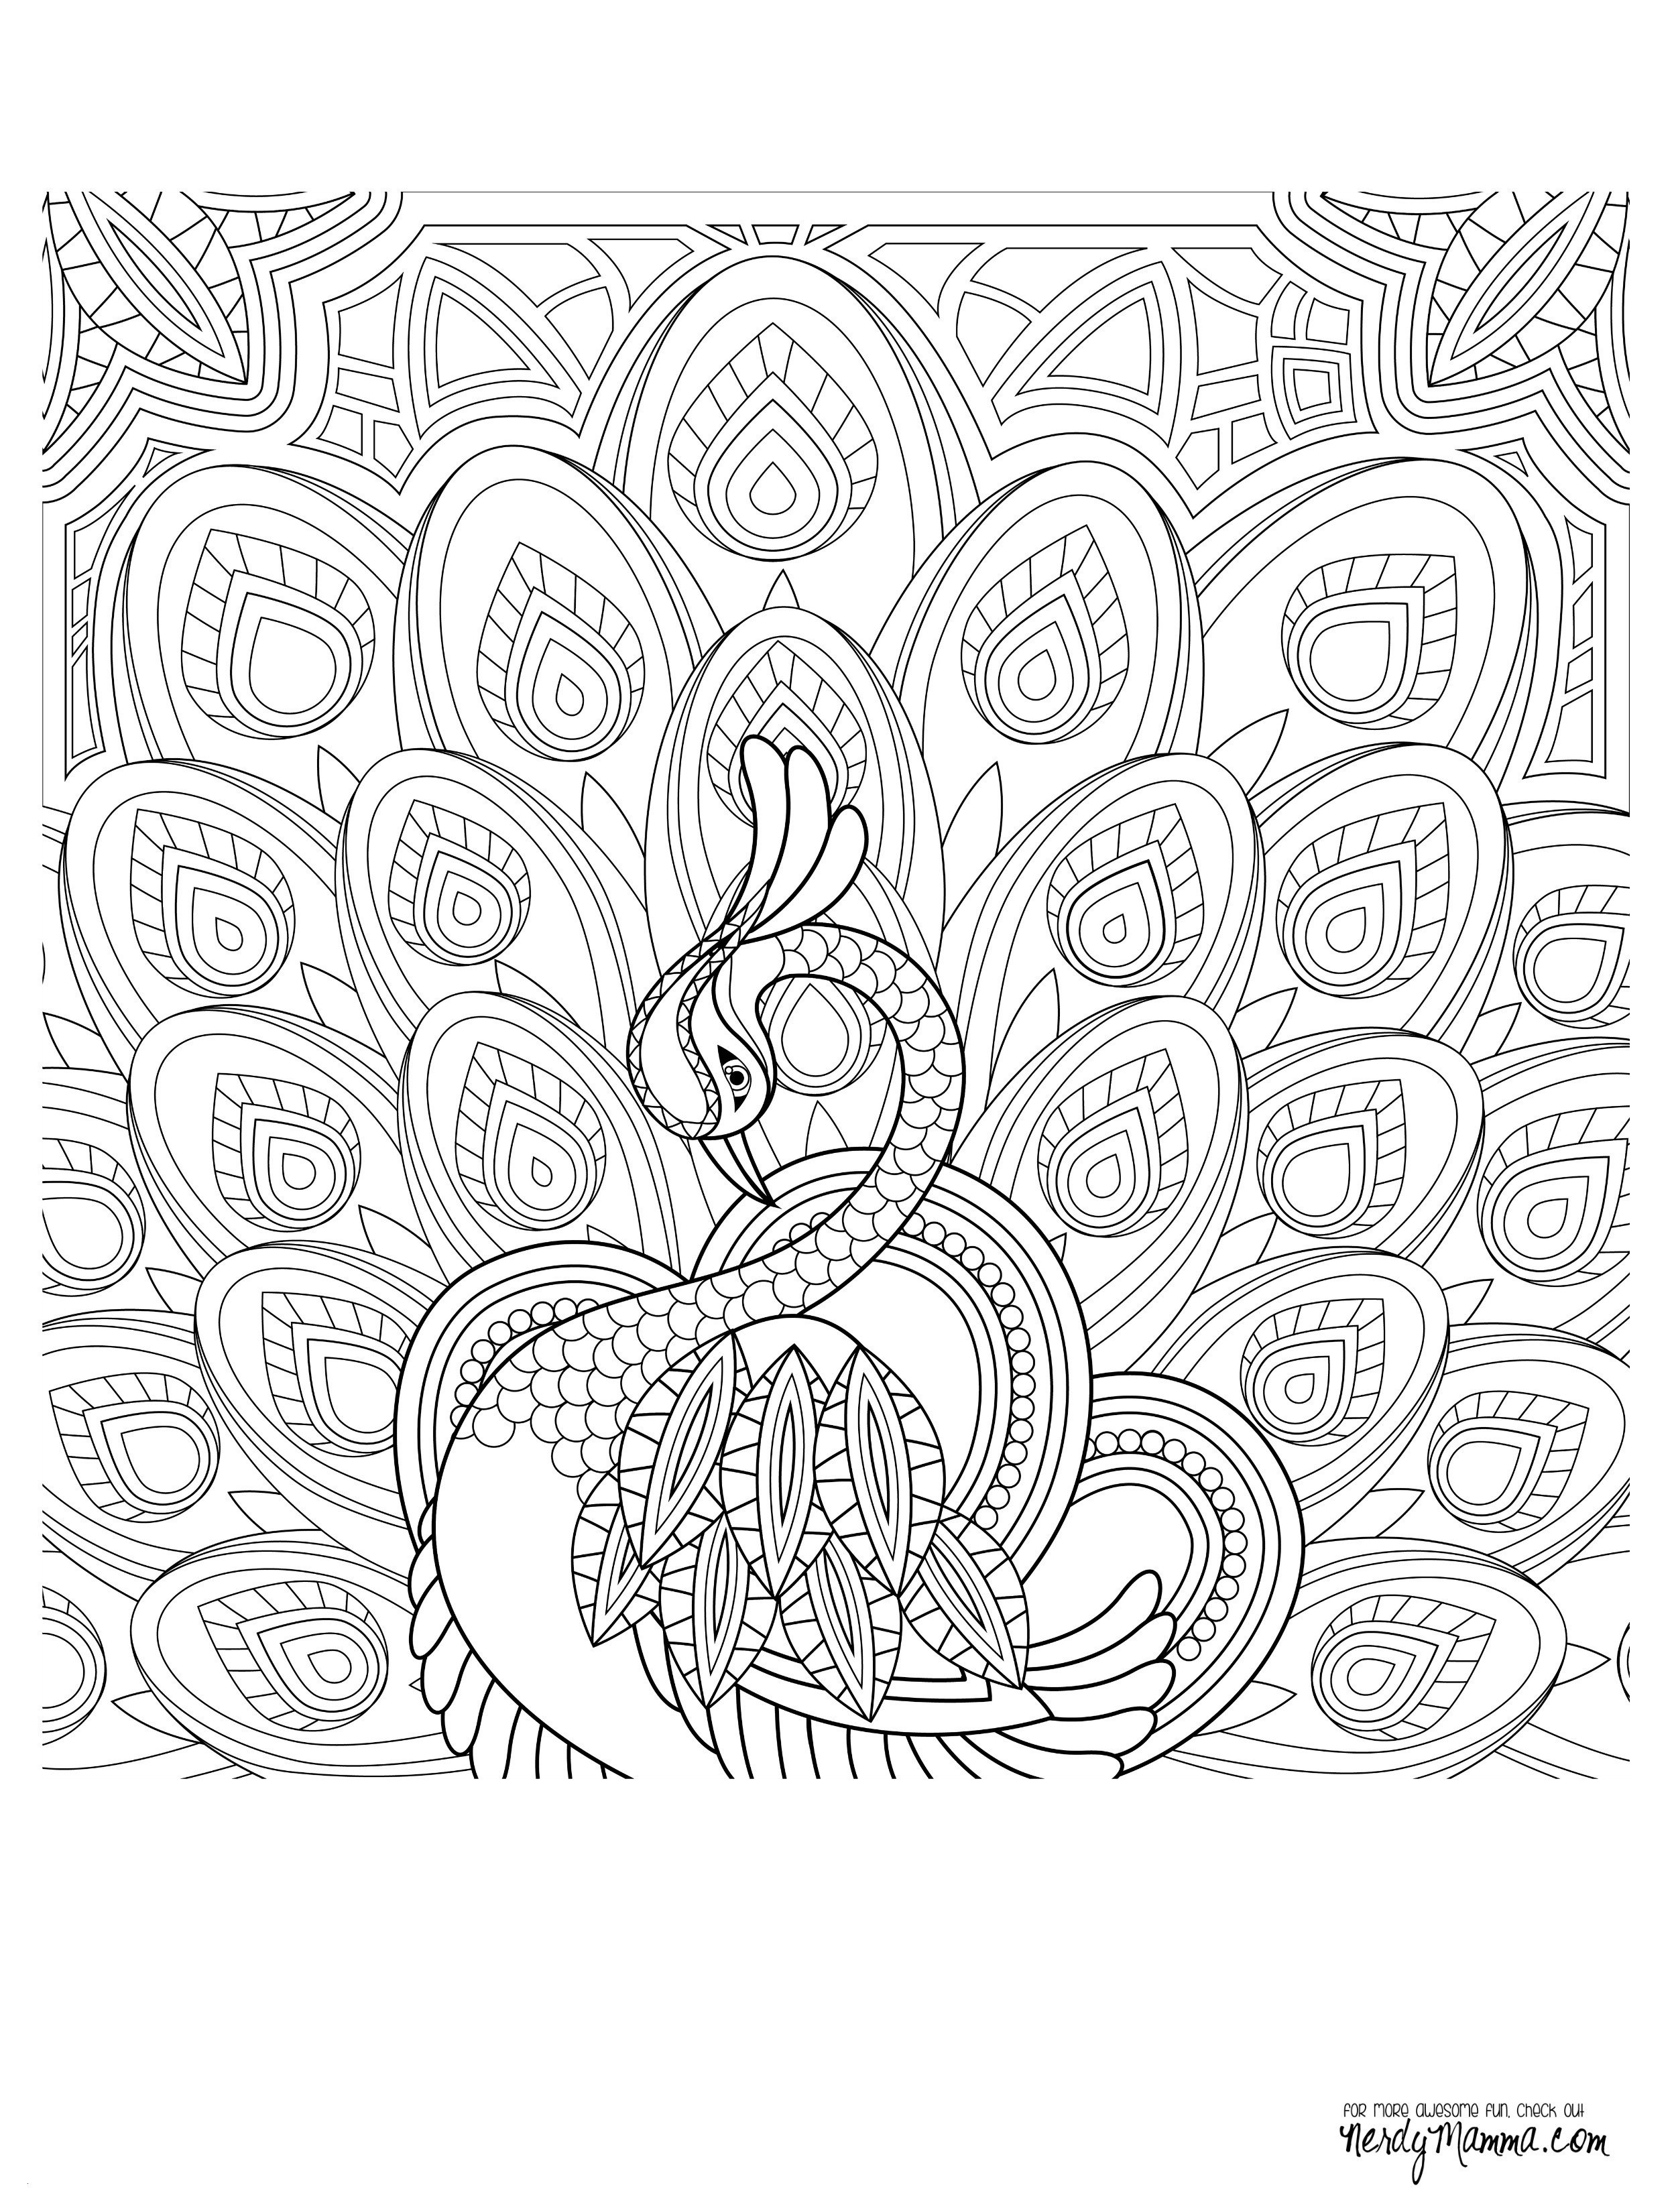 Mandalas Zum Ausdrucken Herzen Genial Herz Malvorlagen Einfach Herz Mandalas Zum Ausdrucken – Malvorlagen Fotografieren